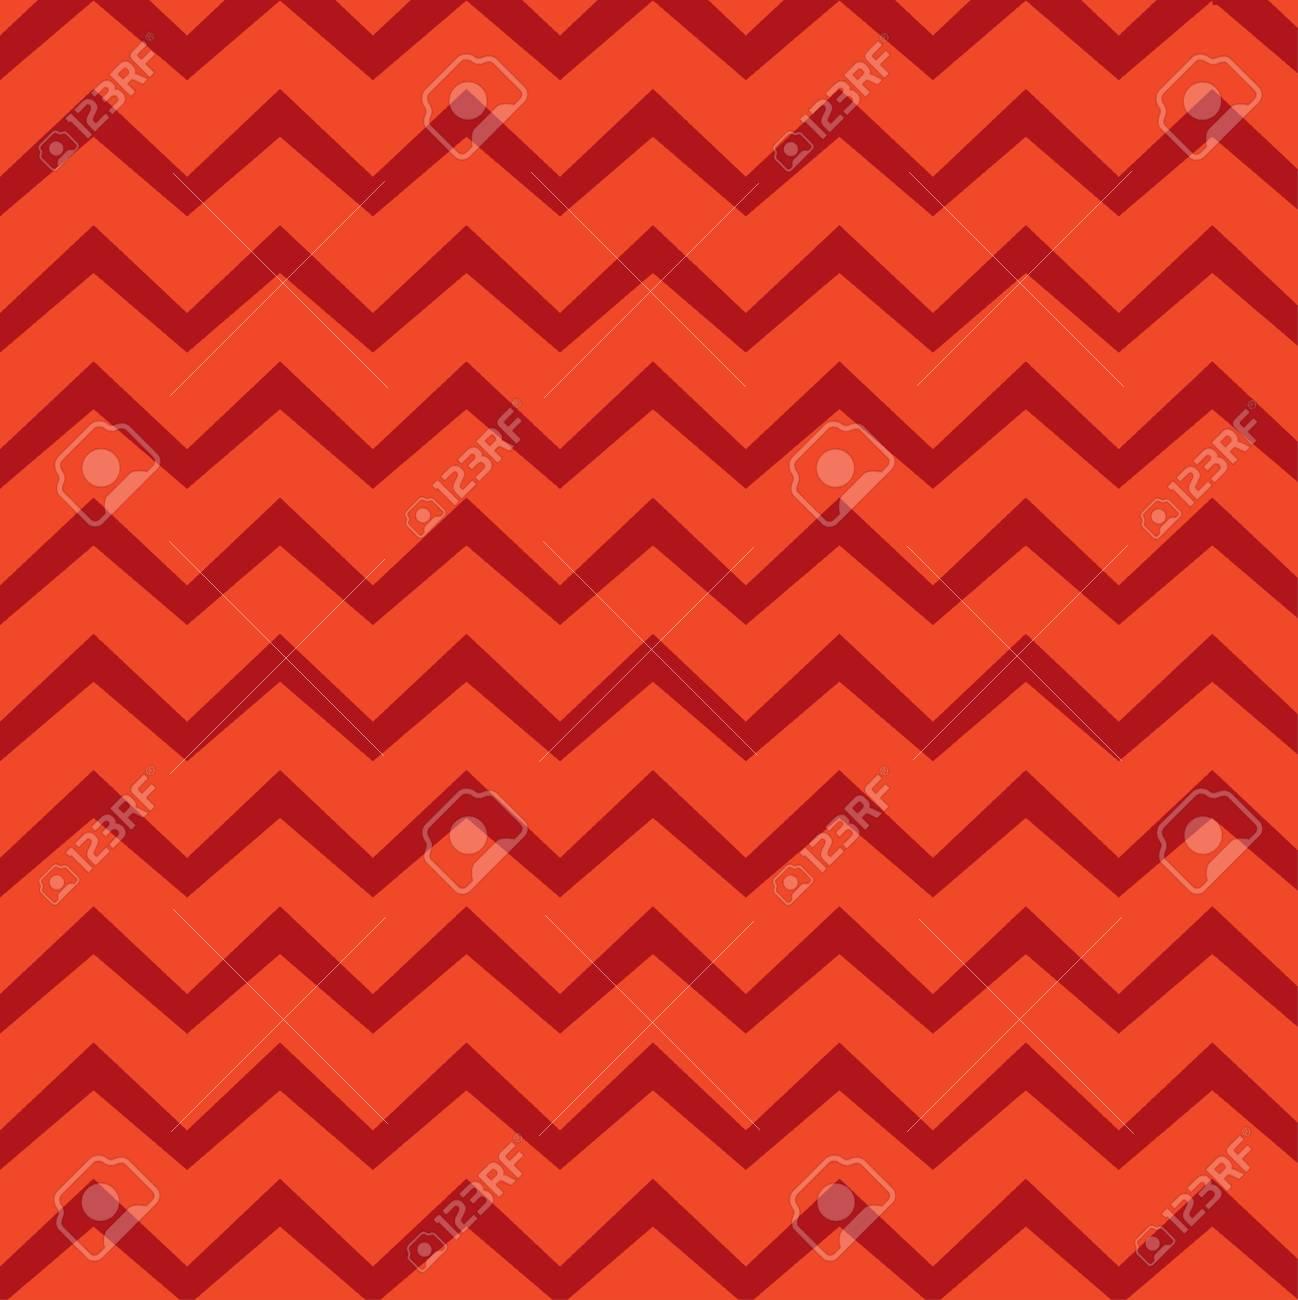 Seamless zigzag line pattern - 114708490